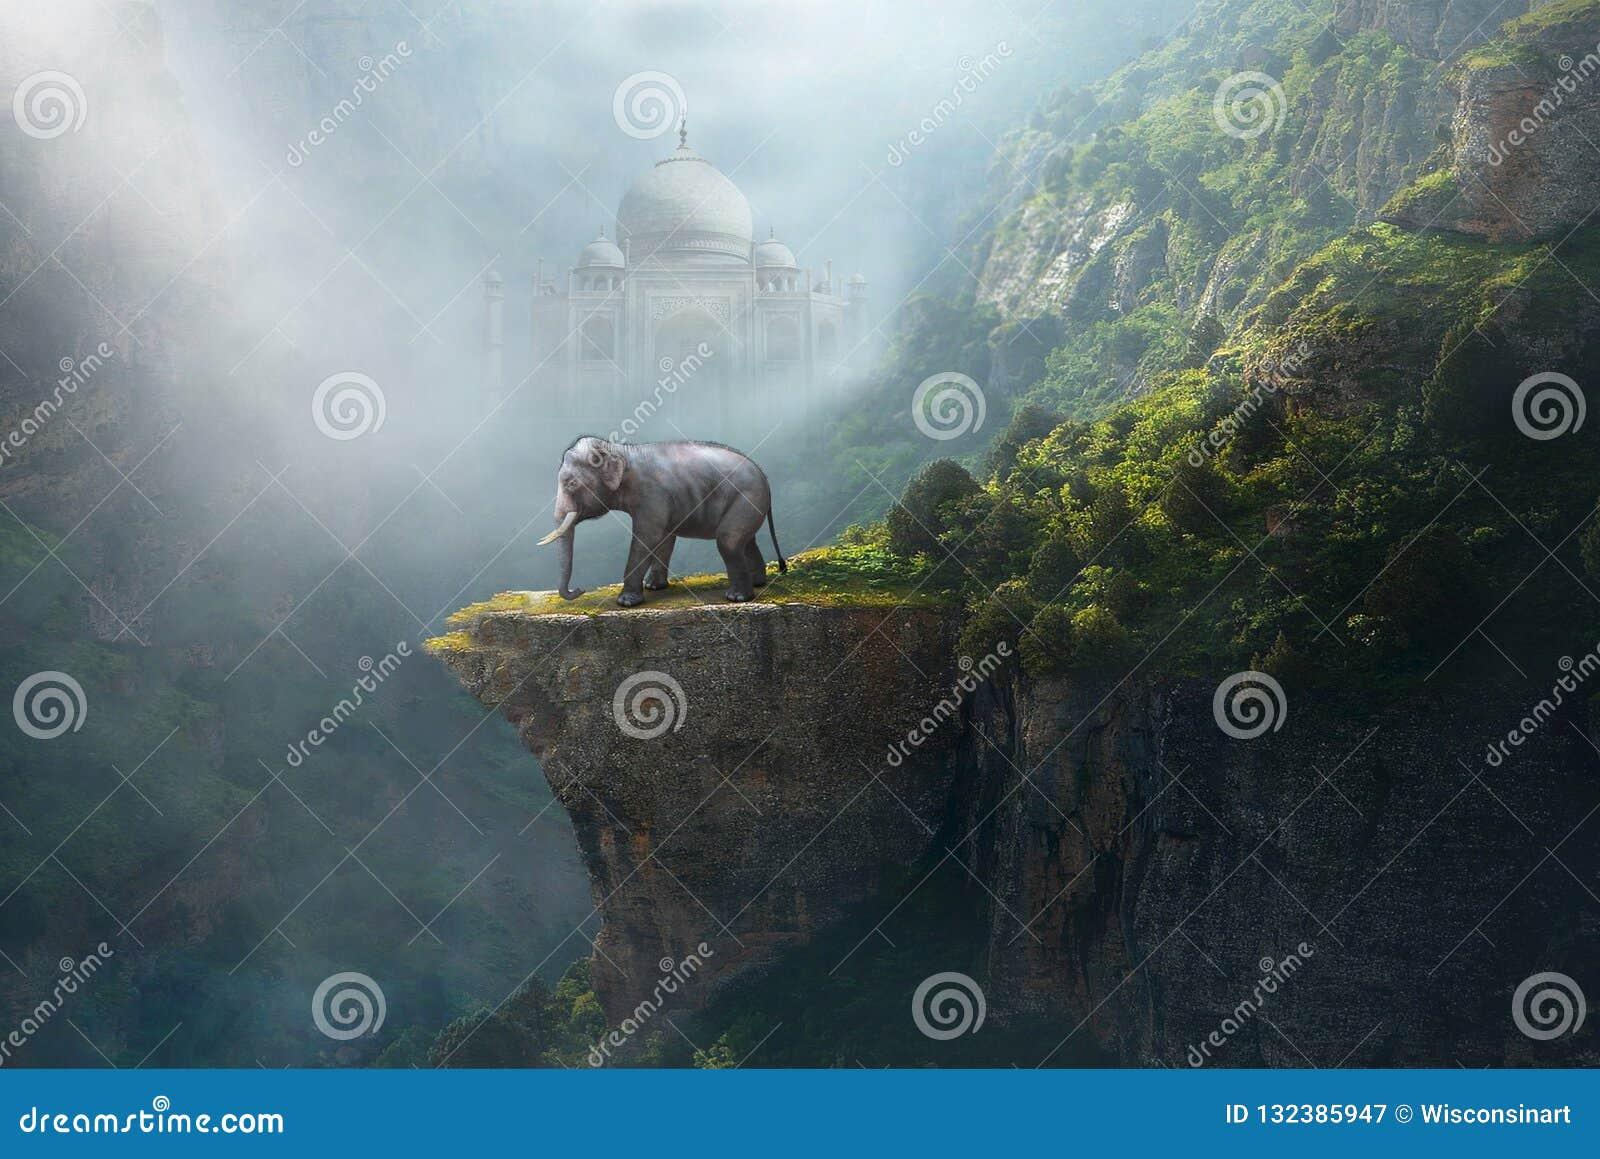 Indian Elephant, Taj Mahal, India, Fantasy Landscape